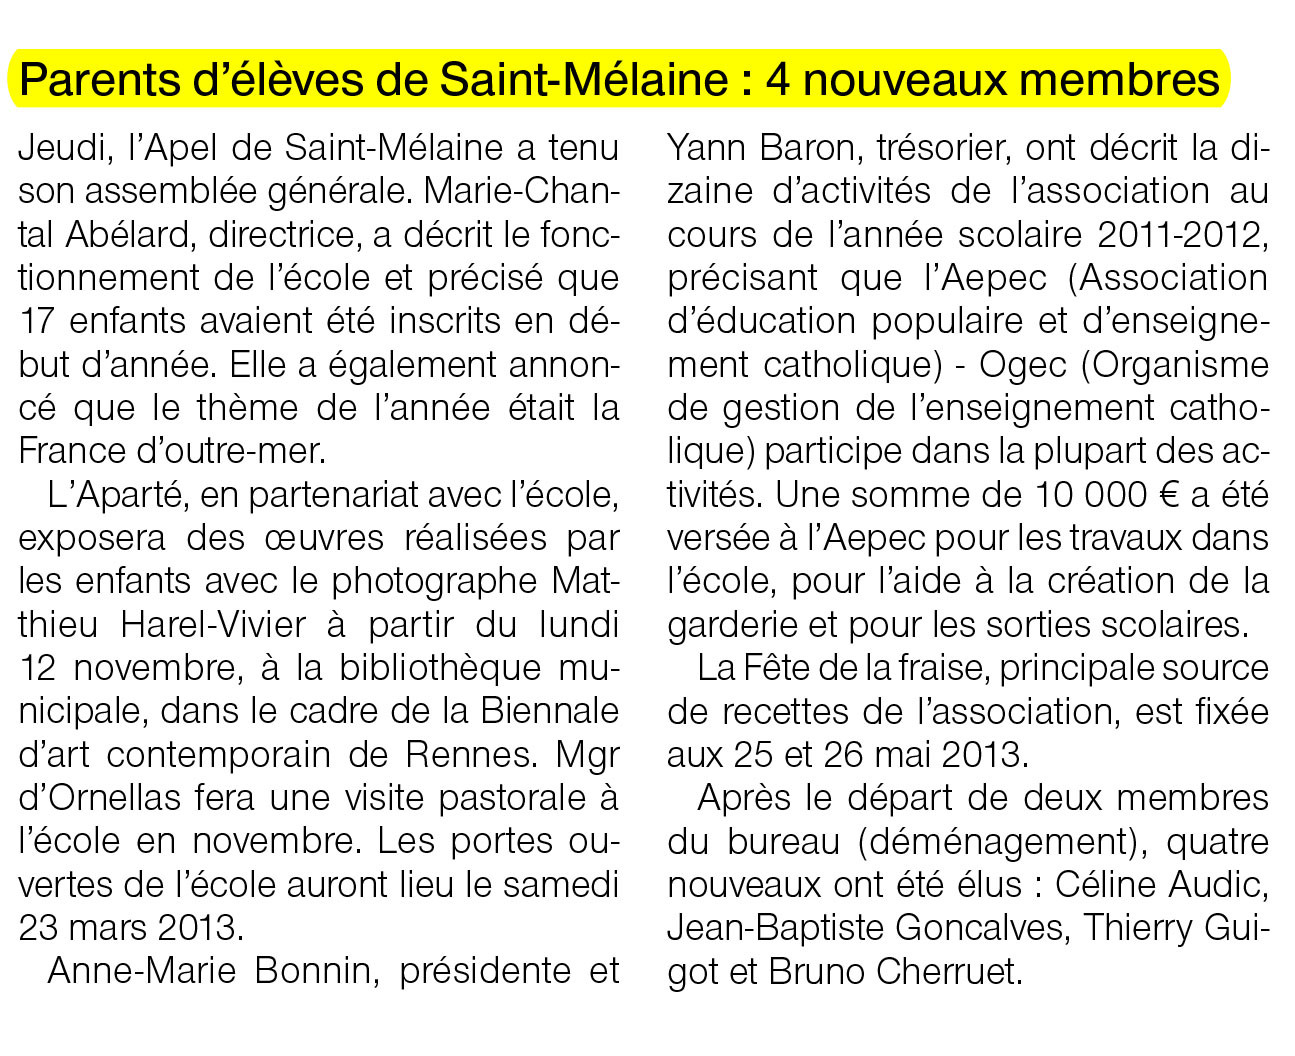 Ouest-France - 22 octobre 2012